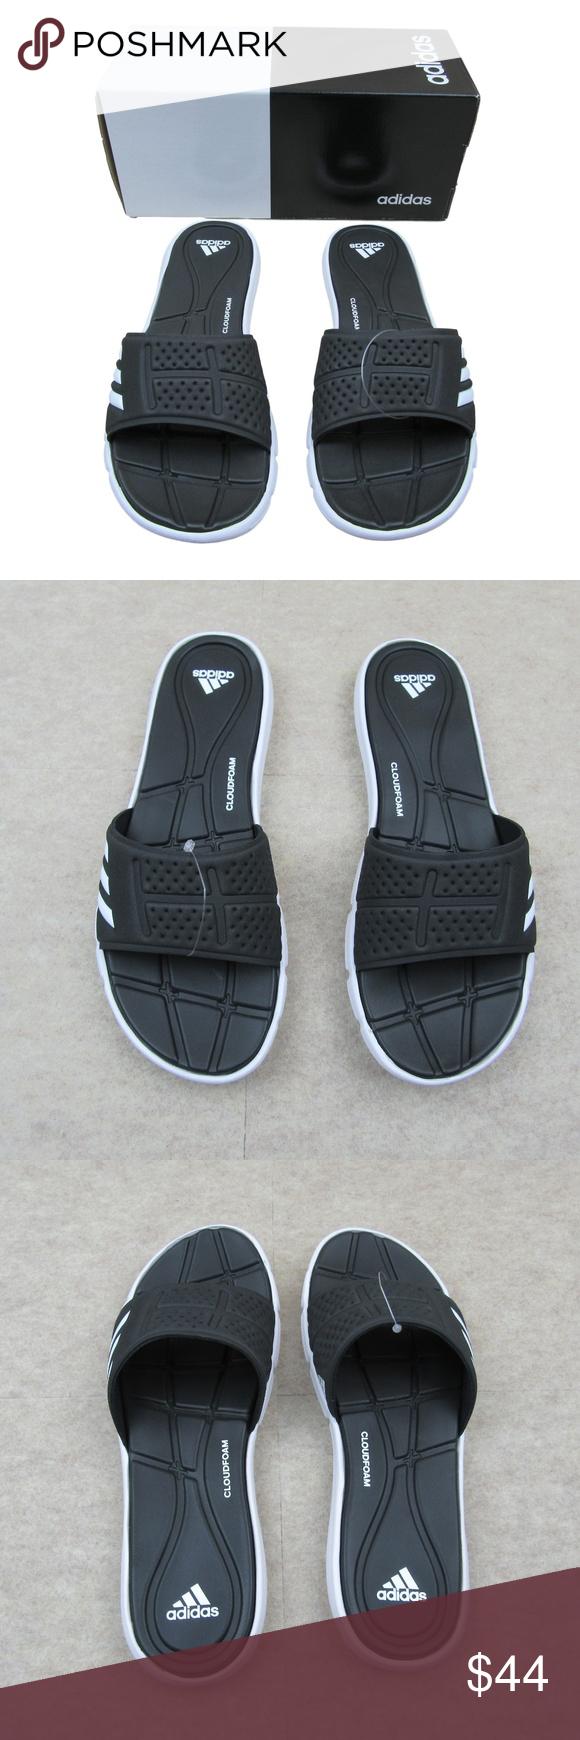 e78c0c828 Adidas Adilette Adipure CF Slippers Sandals Size 8 Adidas Adilette Adipure  CF Slippers Sandals Soft Black Flats BB4558 Size 8 Women s Black   White  Logo ...